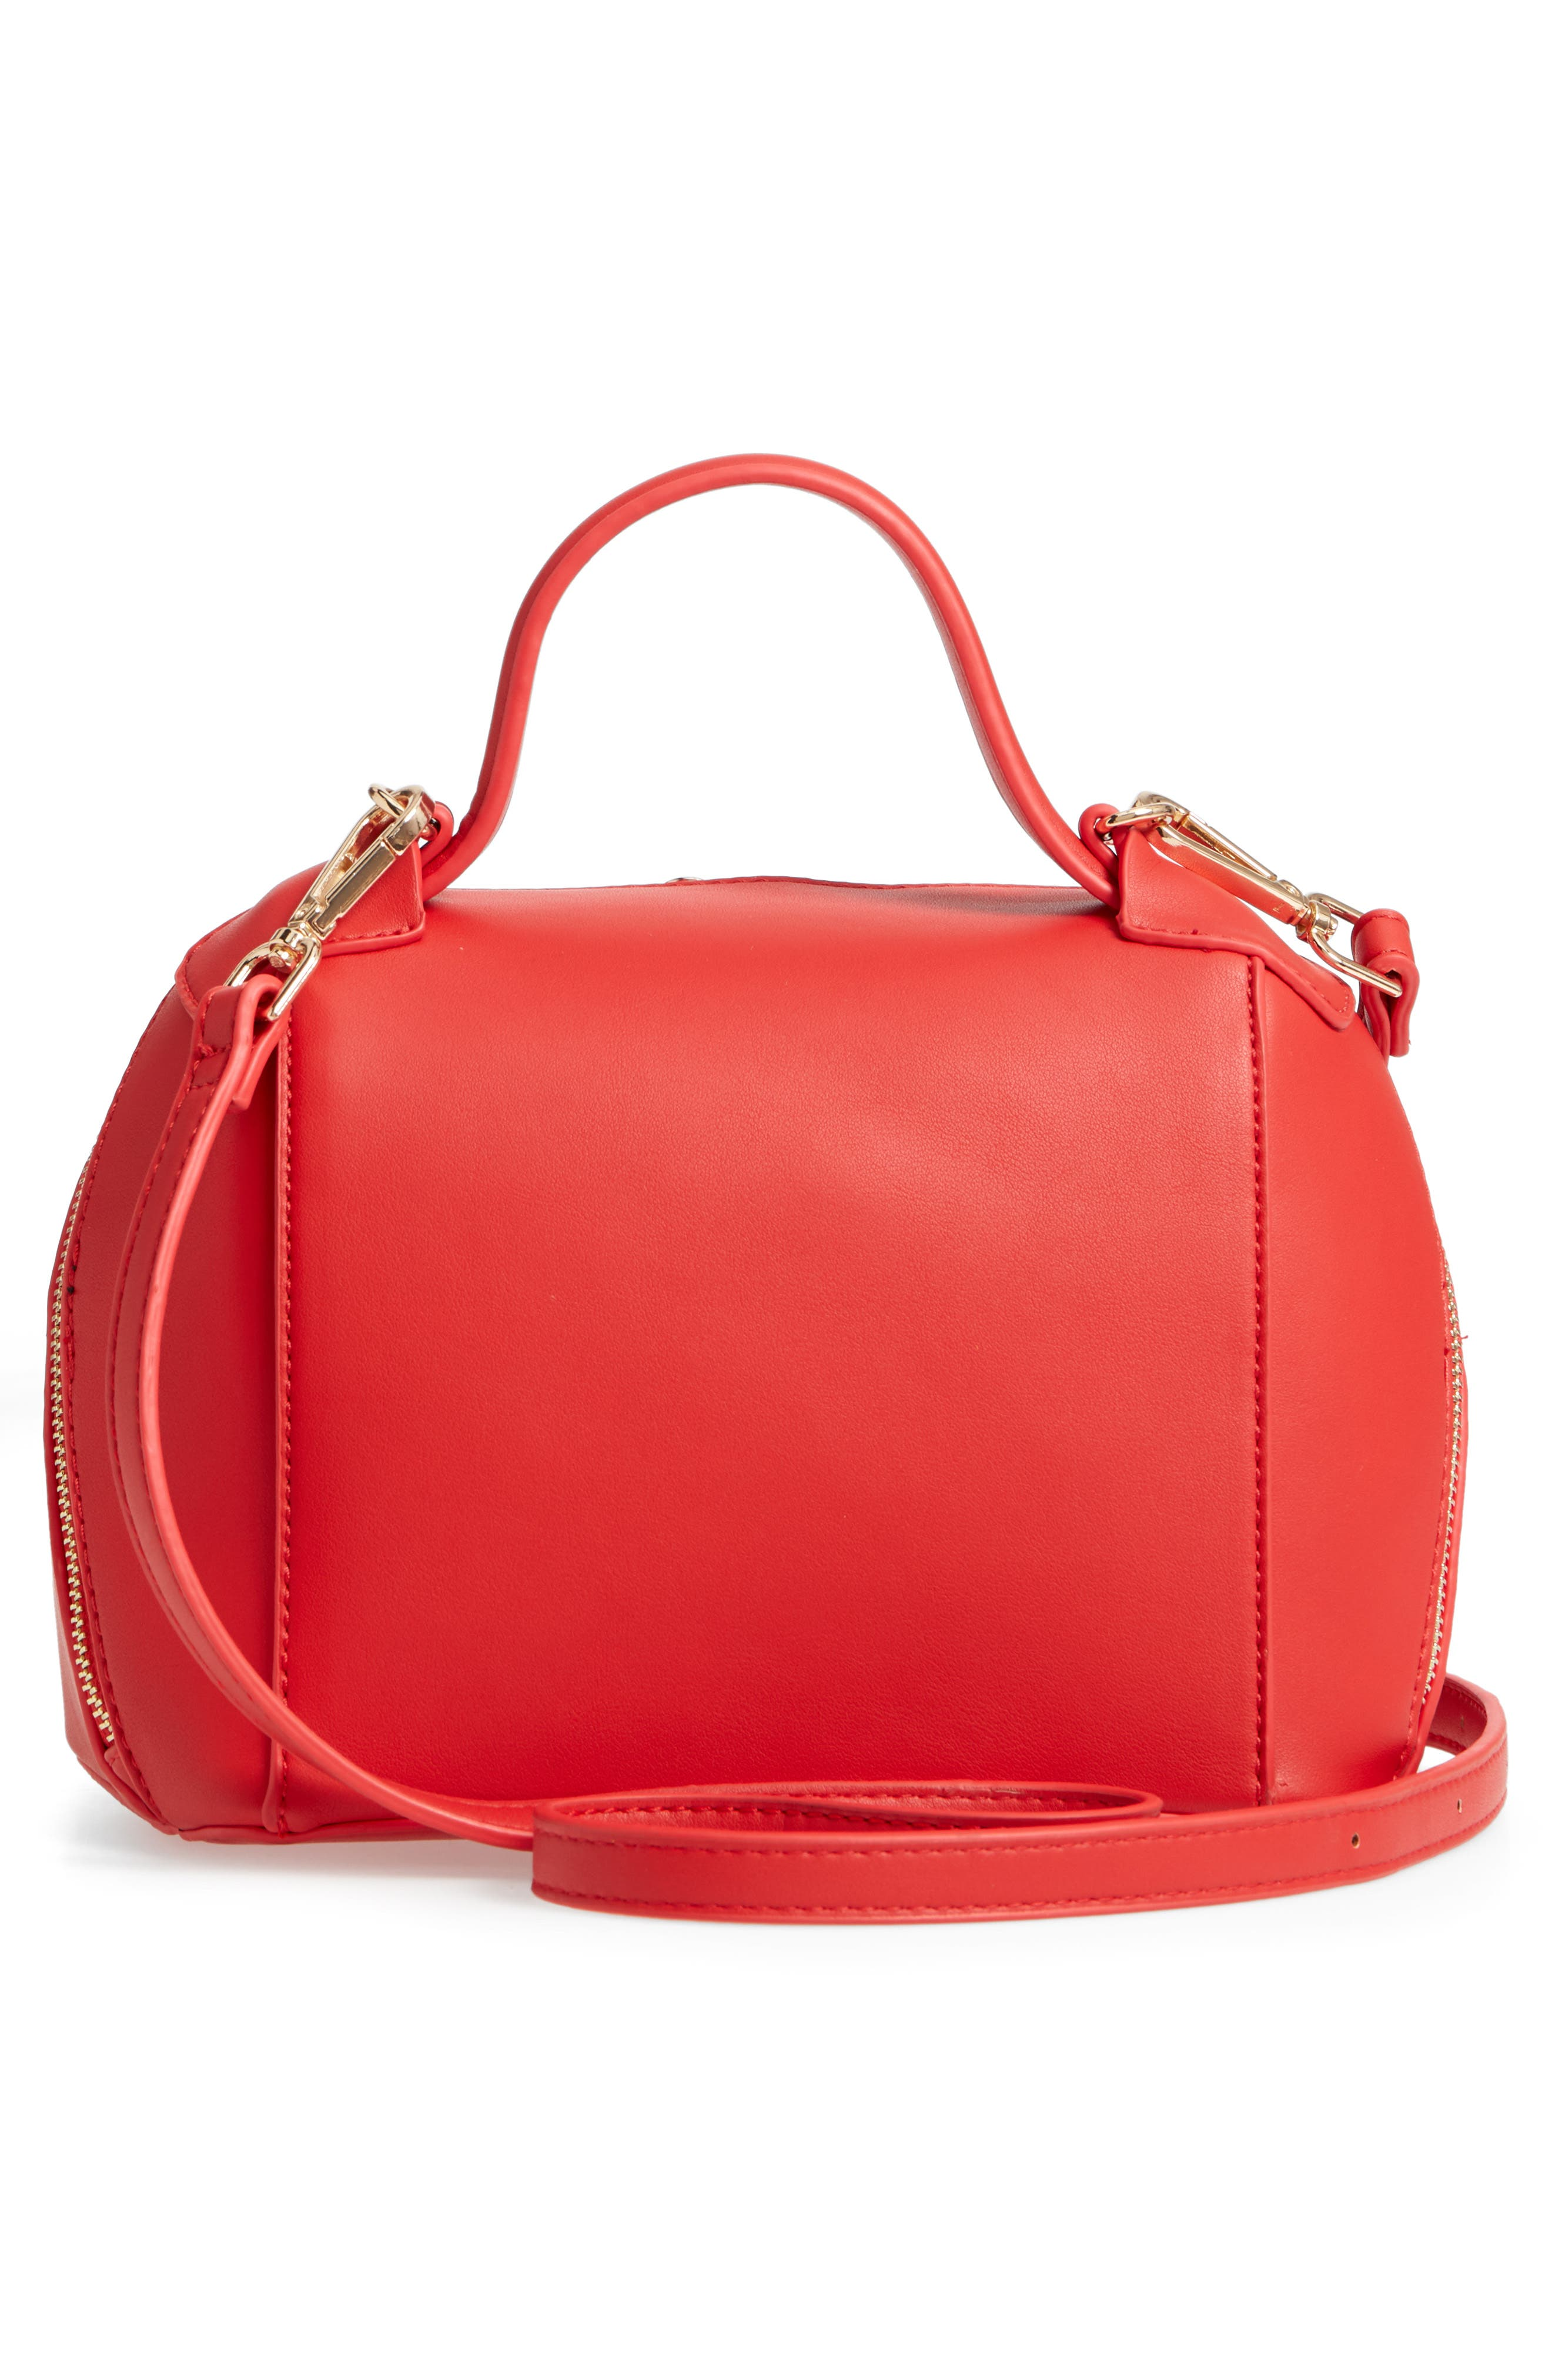 Top Handle Crossbody Bag,                             Alternate thumbnail 3, color,                             Red